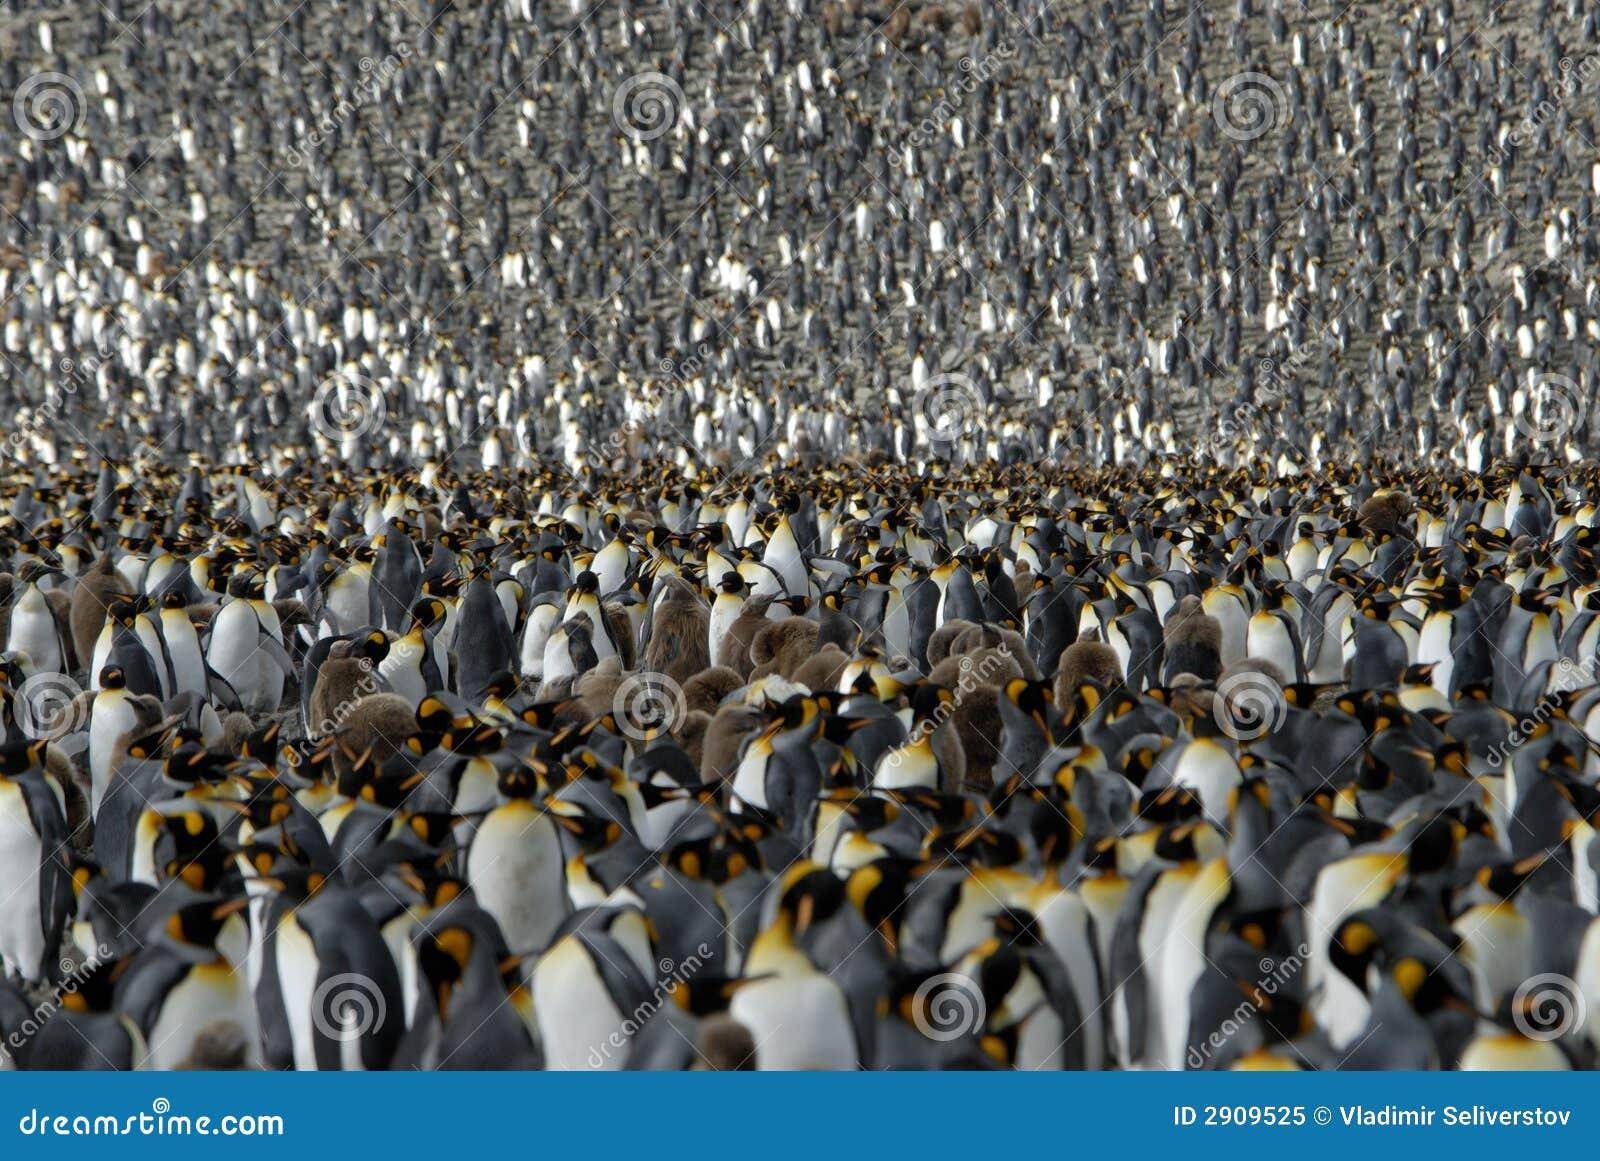 Rey pingüino